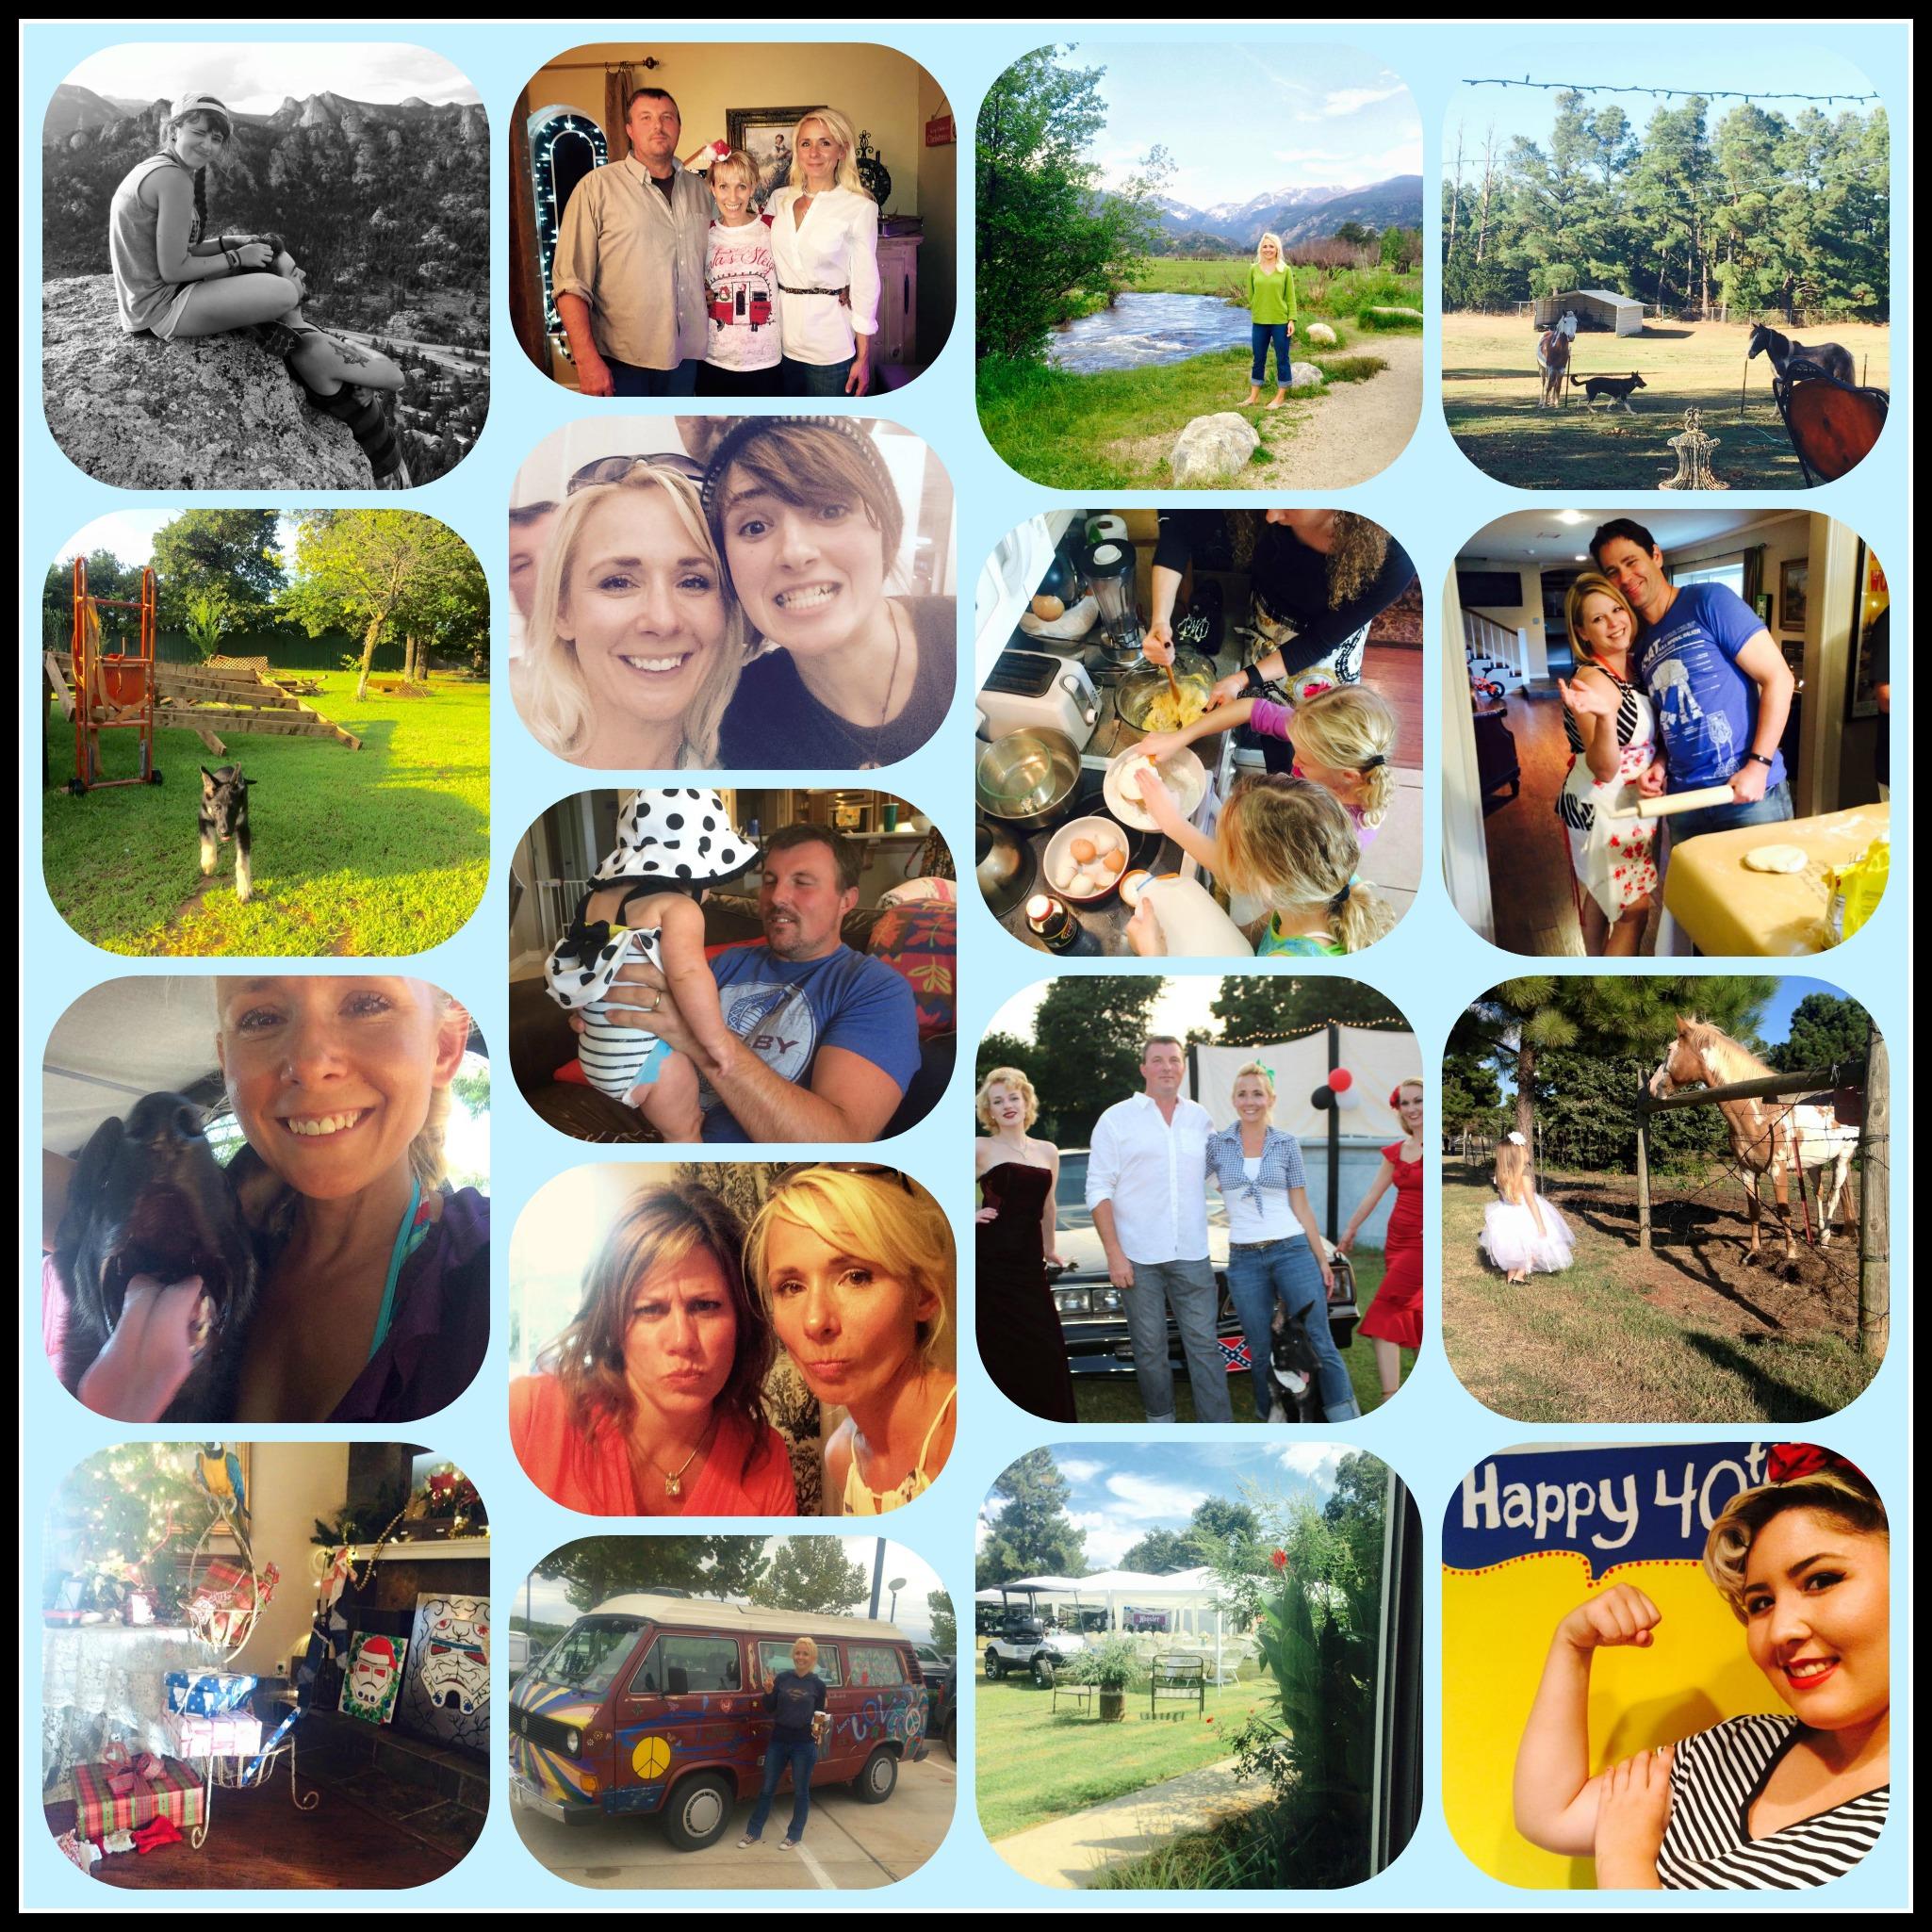 2015 photo collage